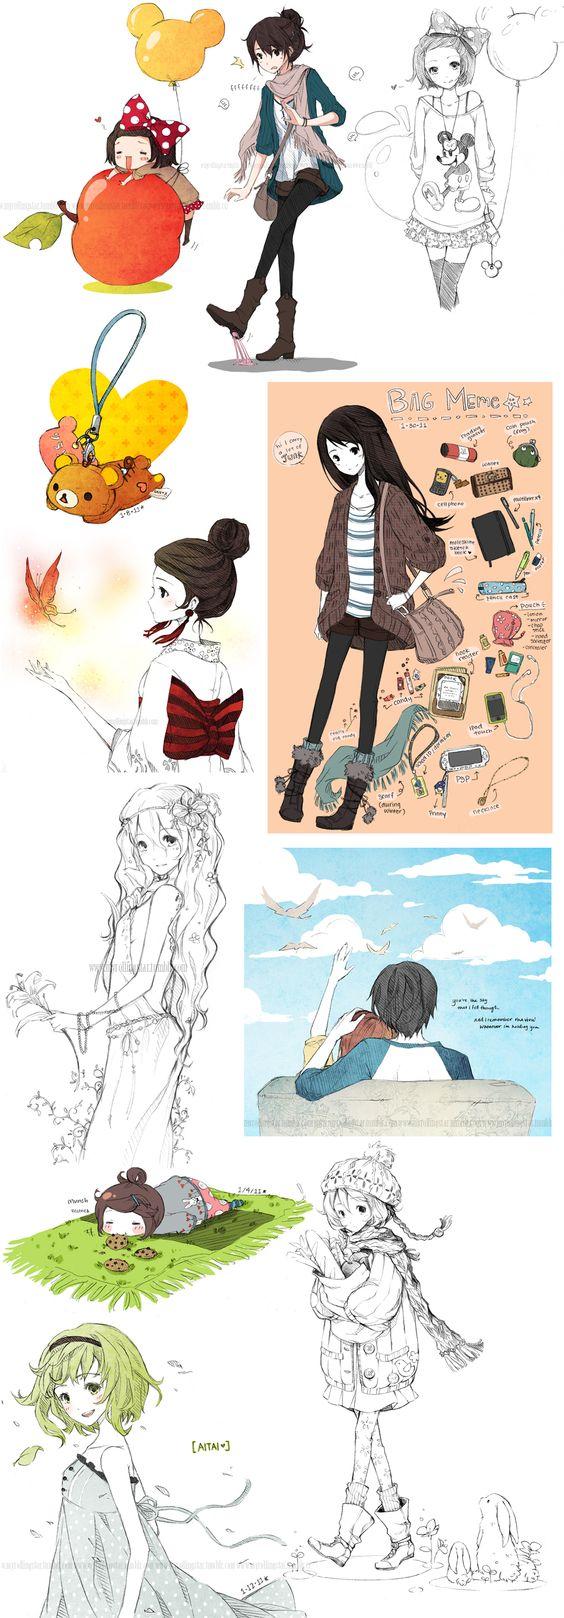 SKETCH DUMP 03  by *cartoongirl7